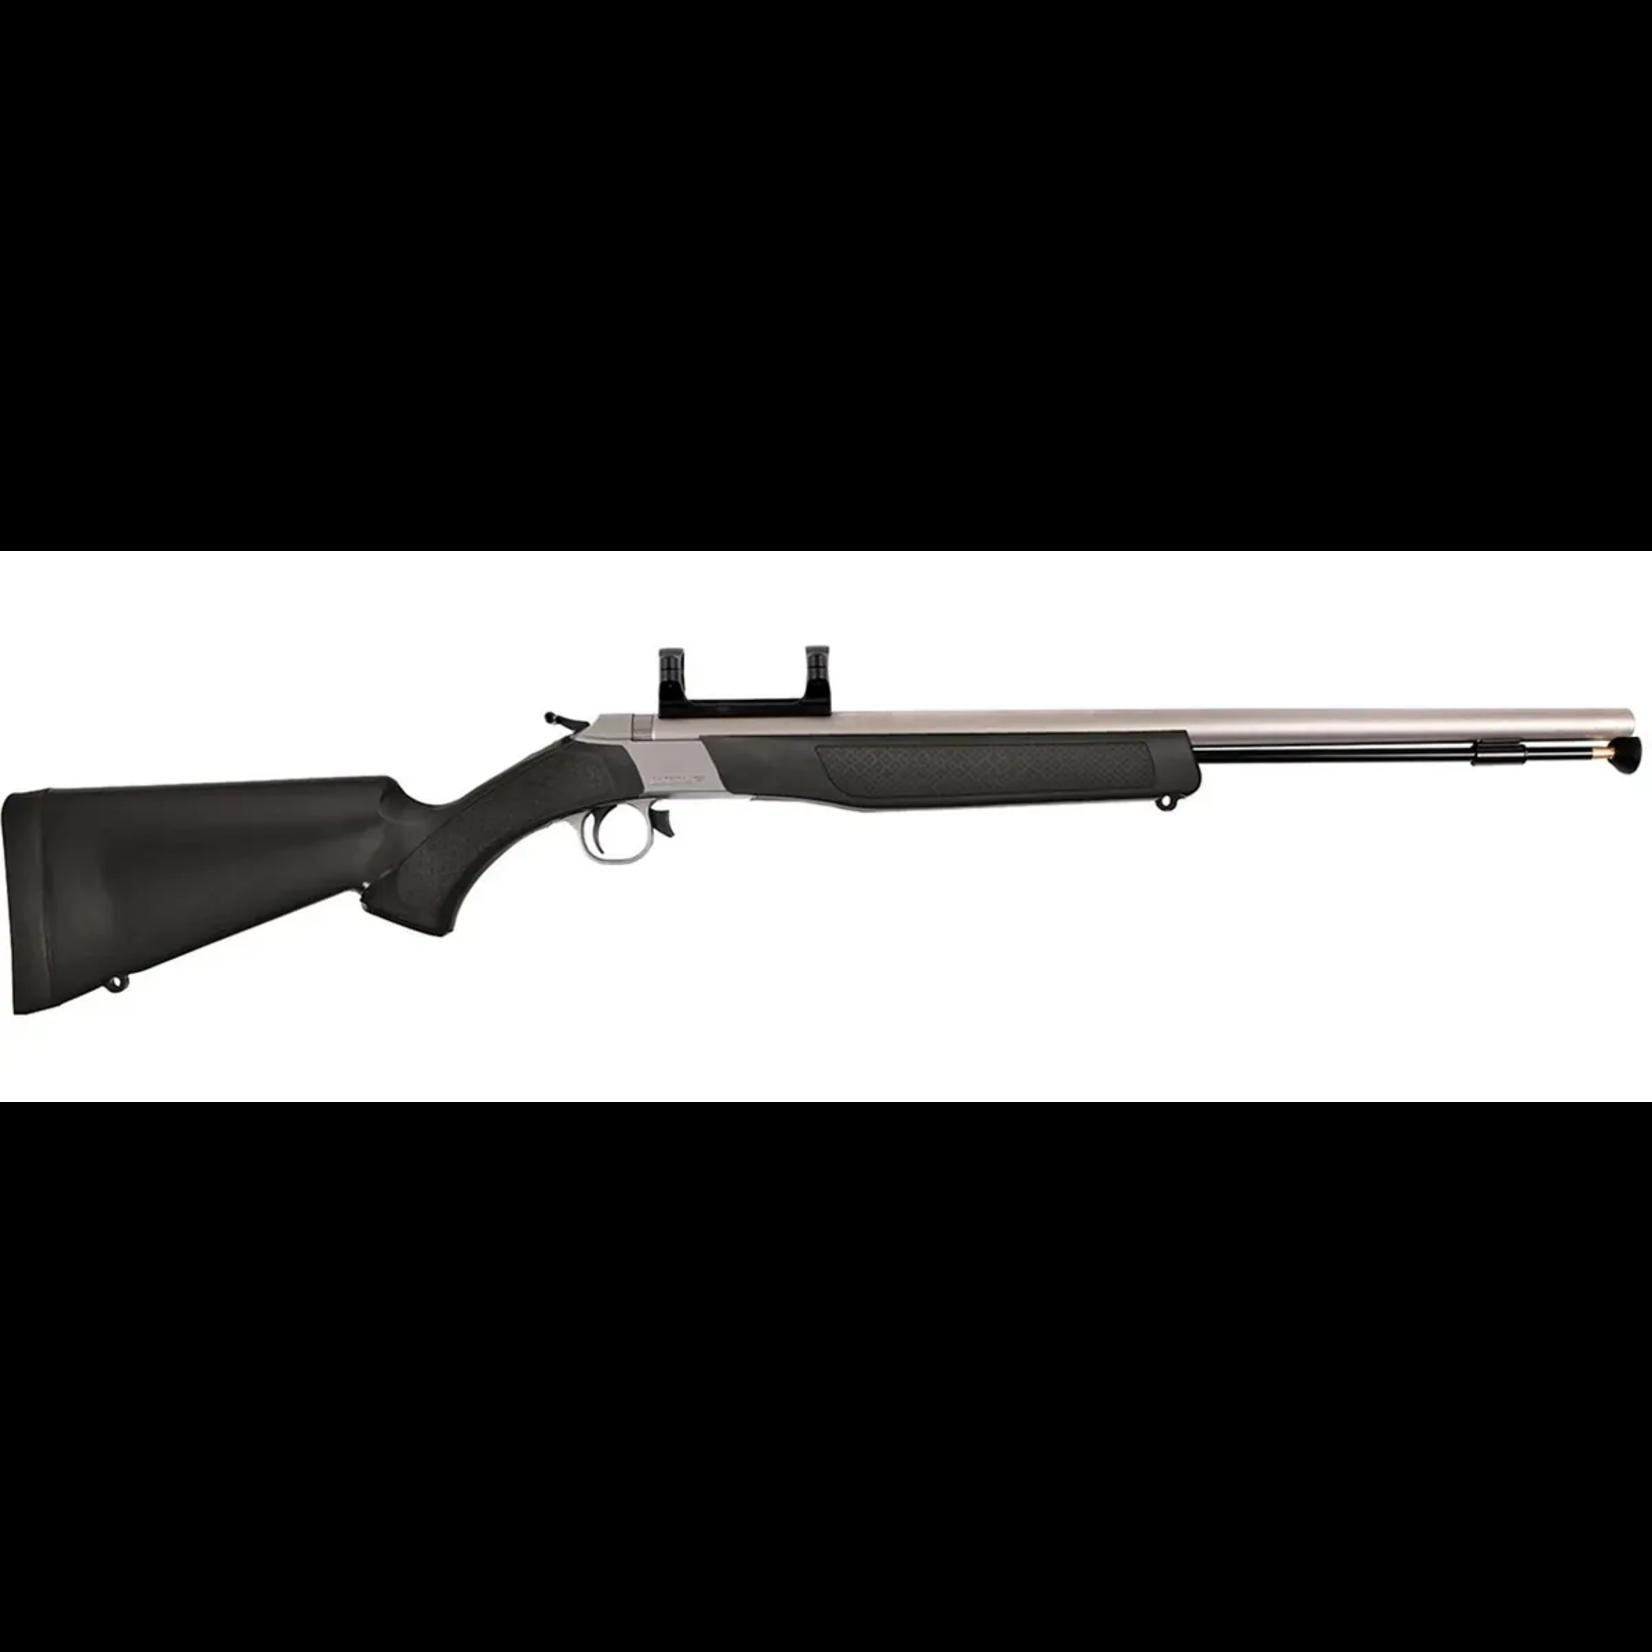 CVA Cva Pr2110Sm Wolf Muzzleloading Rifle Ss/Black .50Cal (Ism)